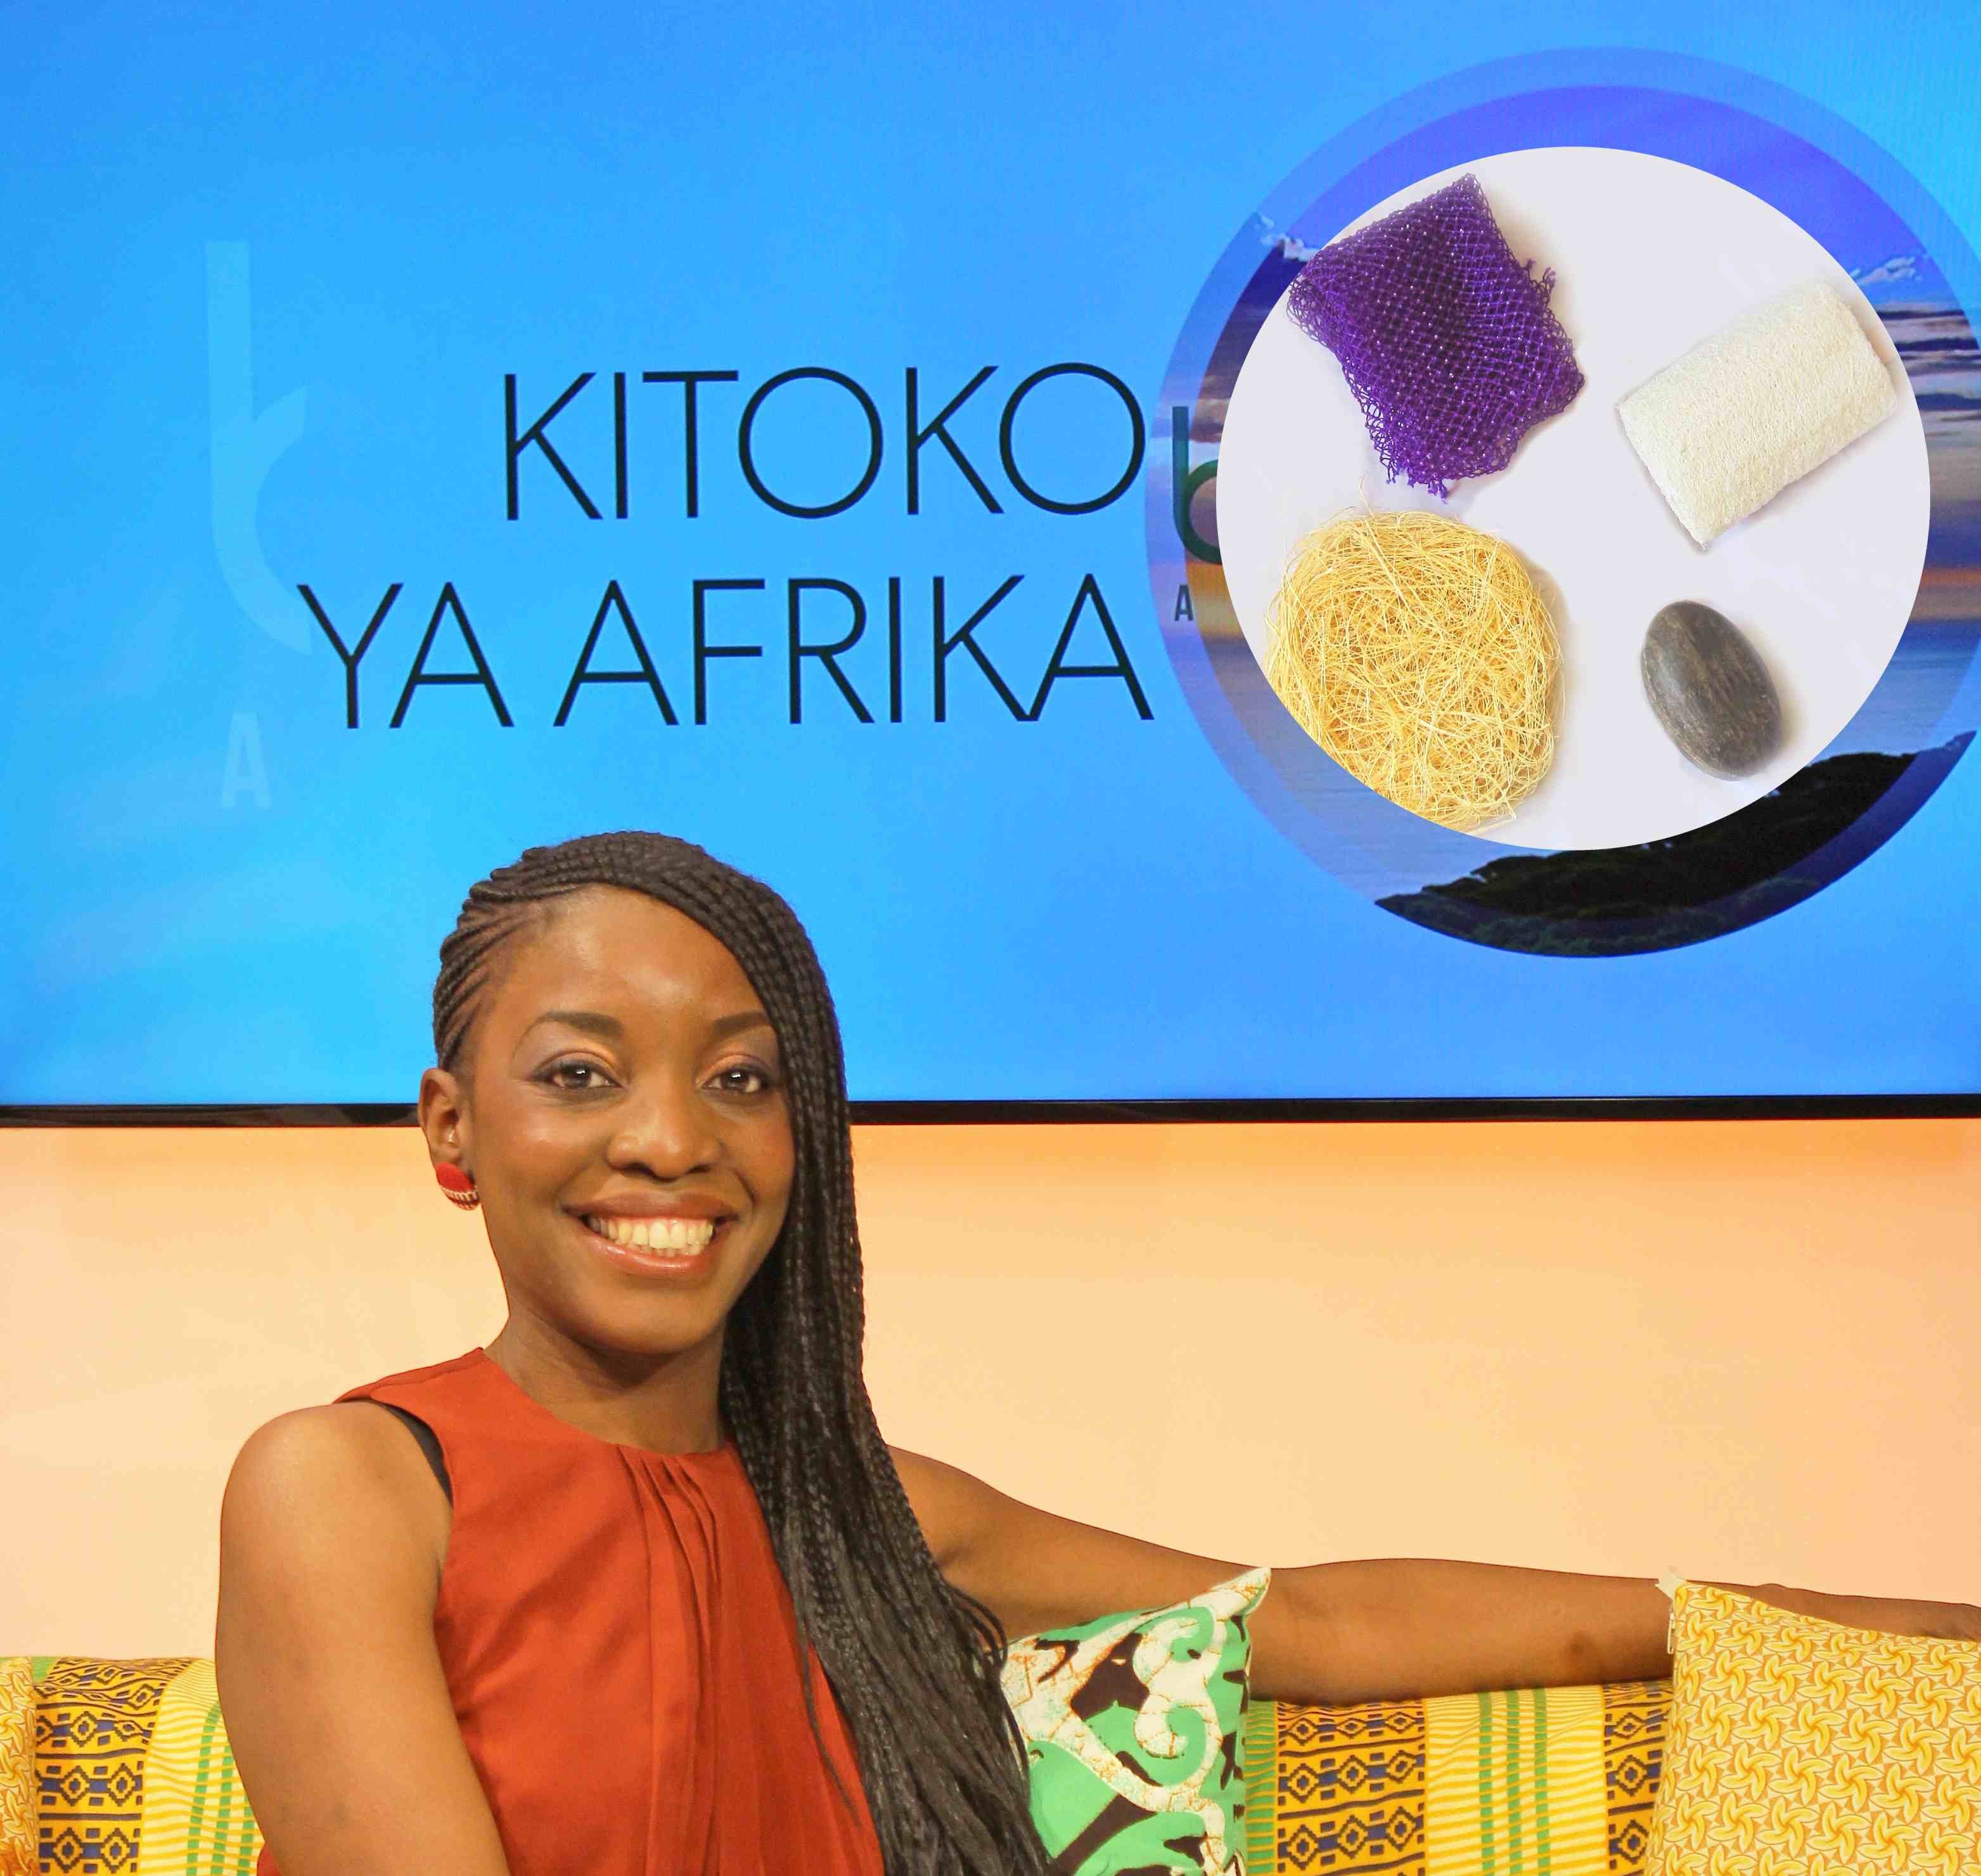 1kitoko ya afrika produits pour se laver afriquesavon noir gant loofah filet